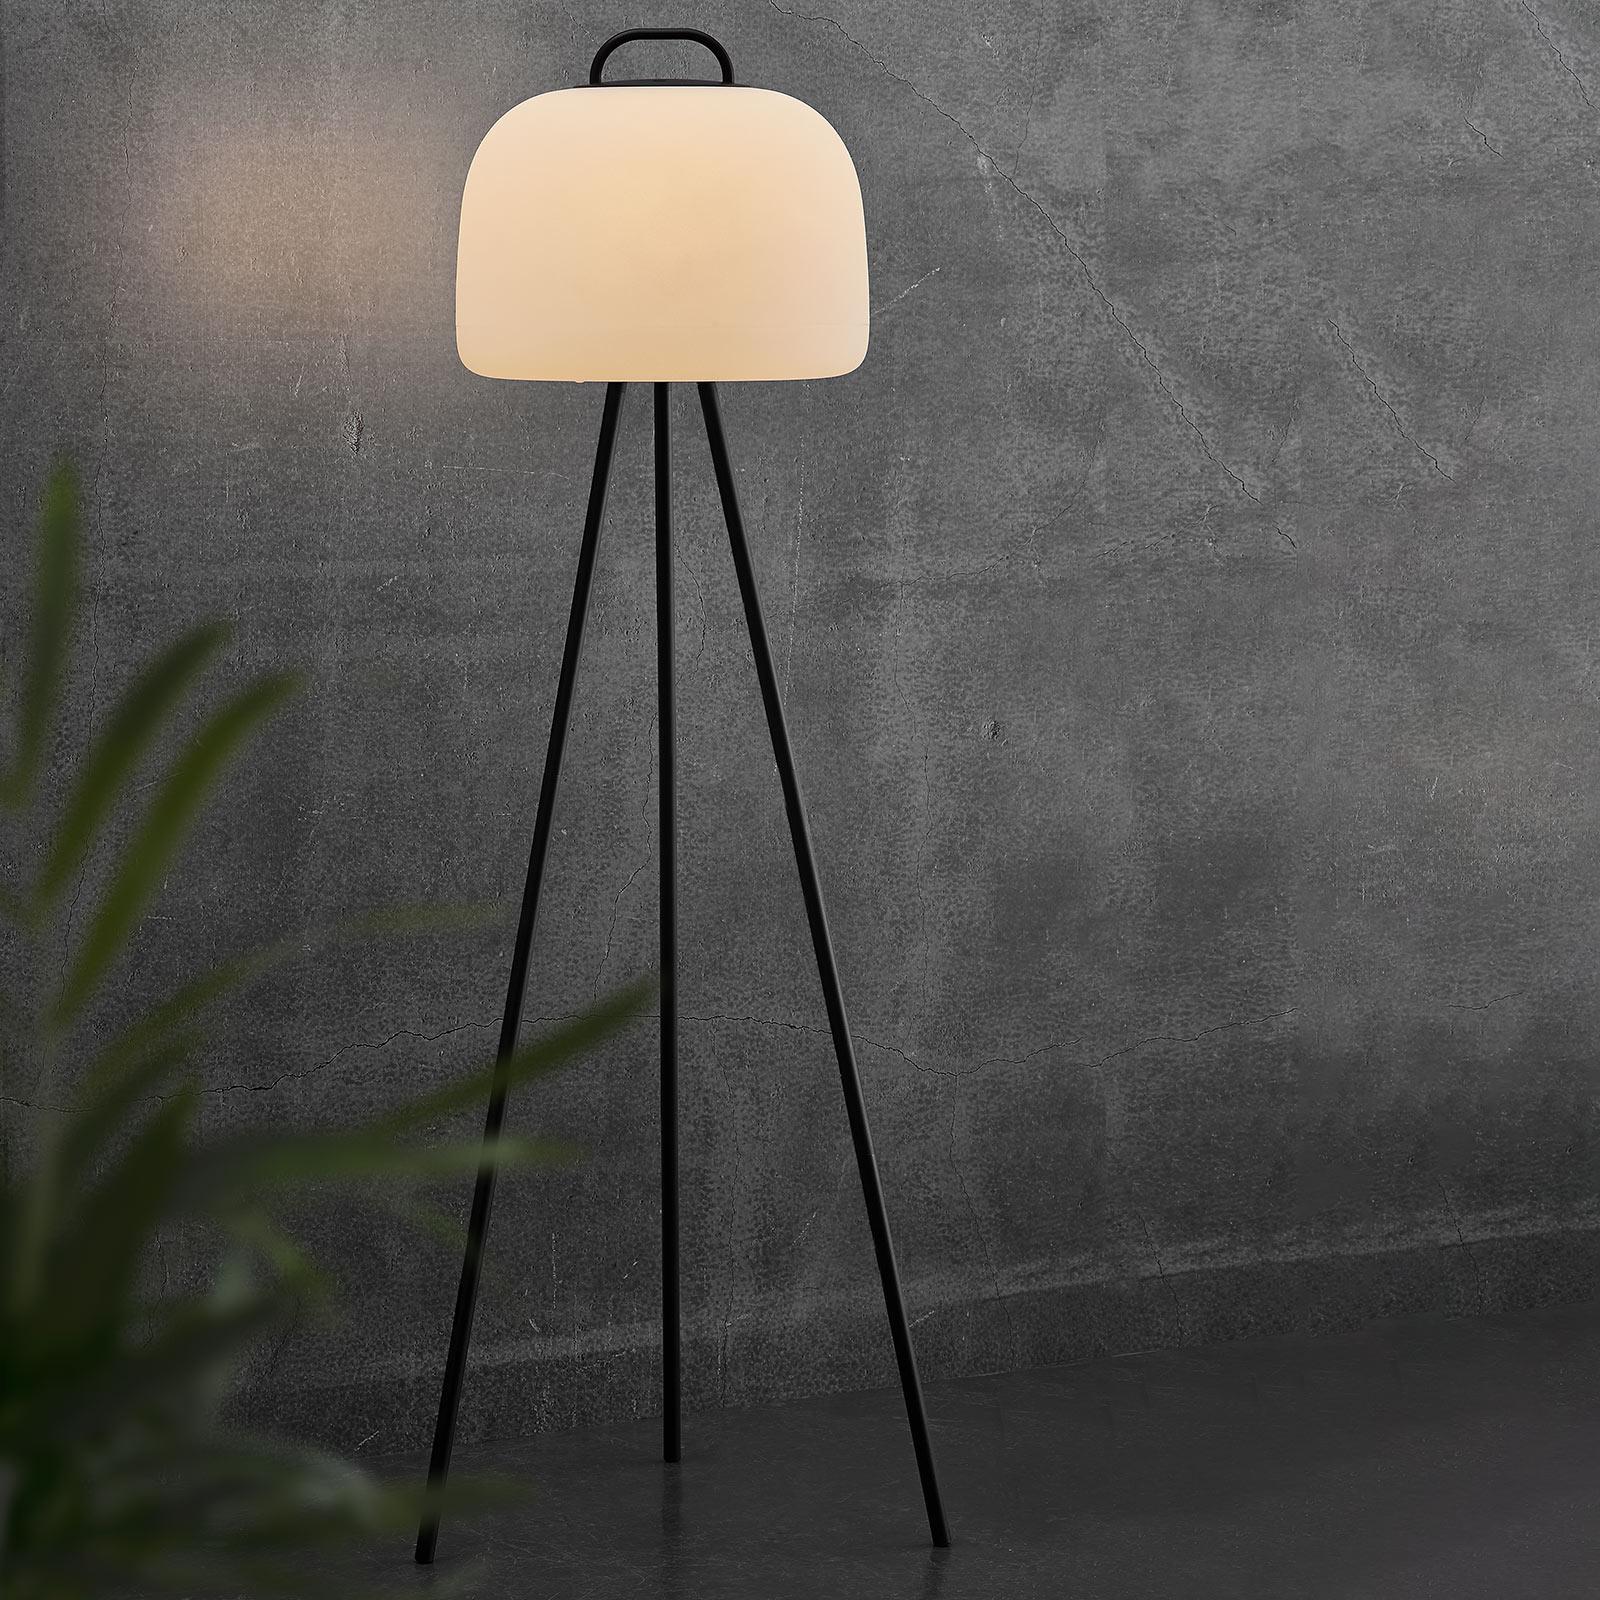 LED vloerlamp Kettle tripod metaal, kap 36cm